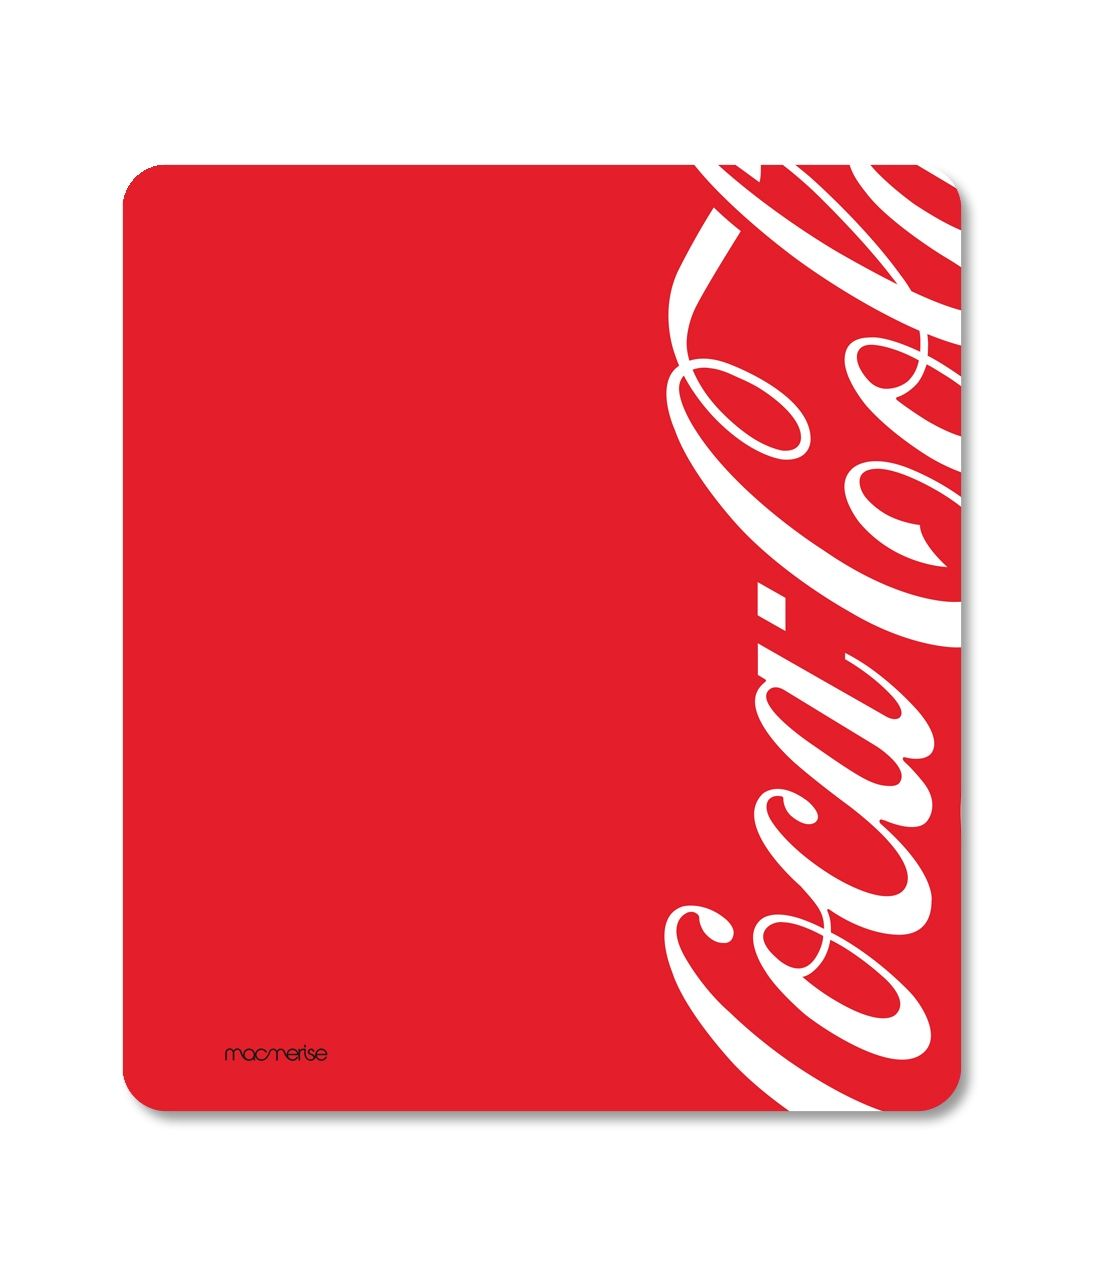 Coke Red White - Macmerise Mouse Pad